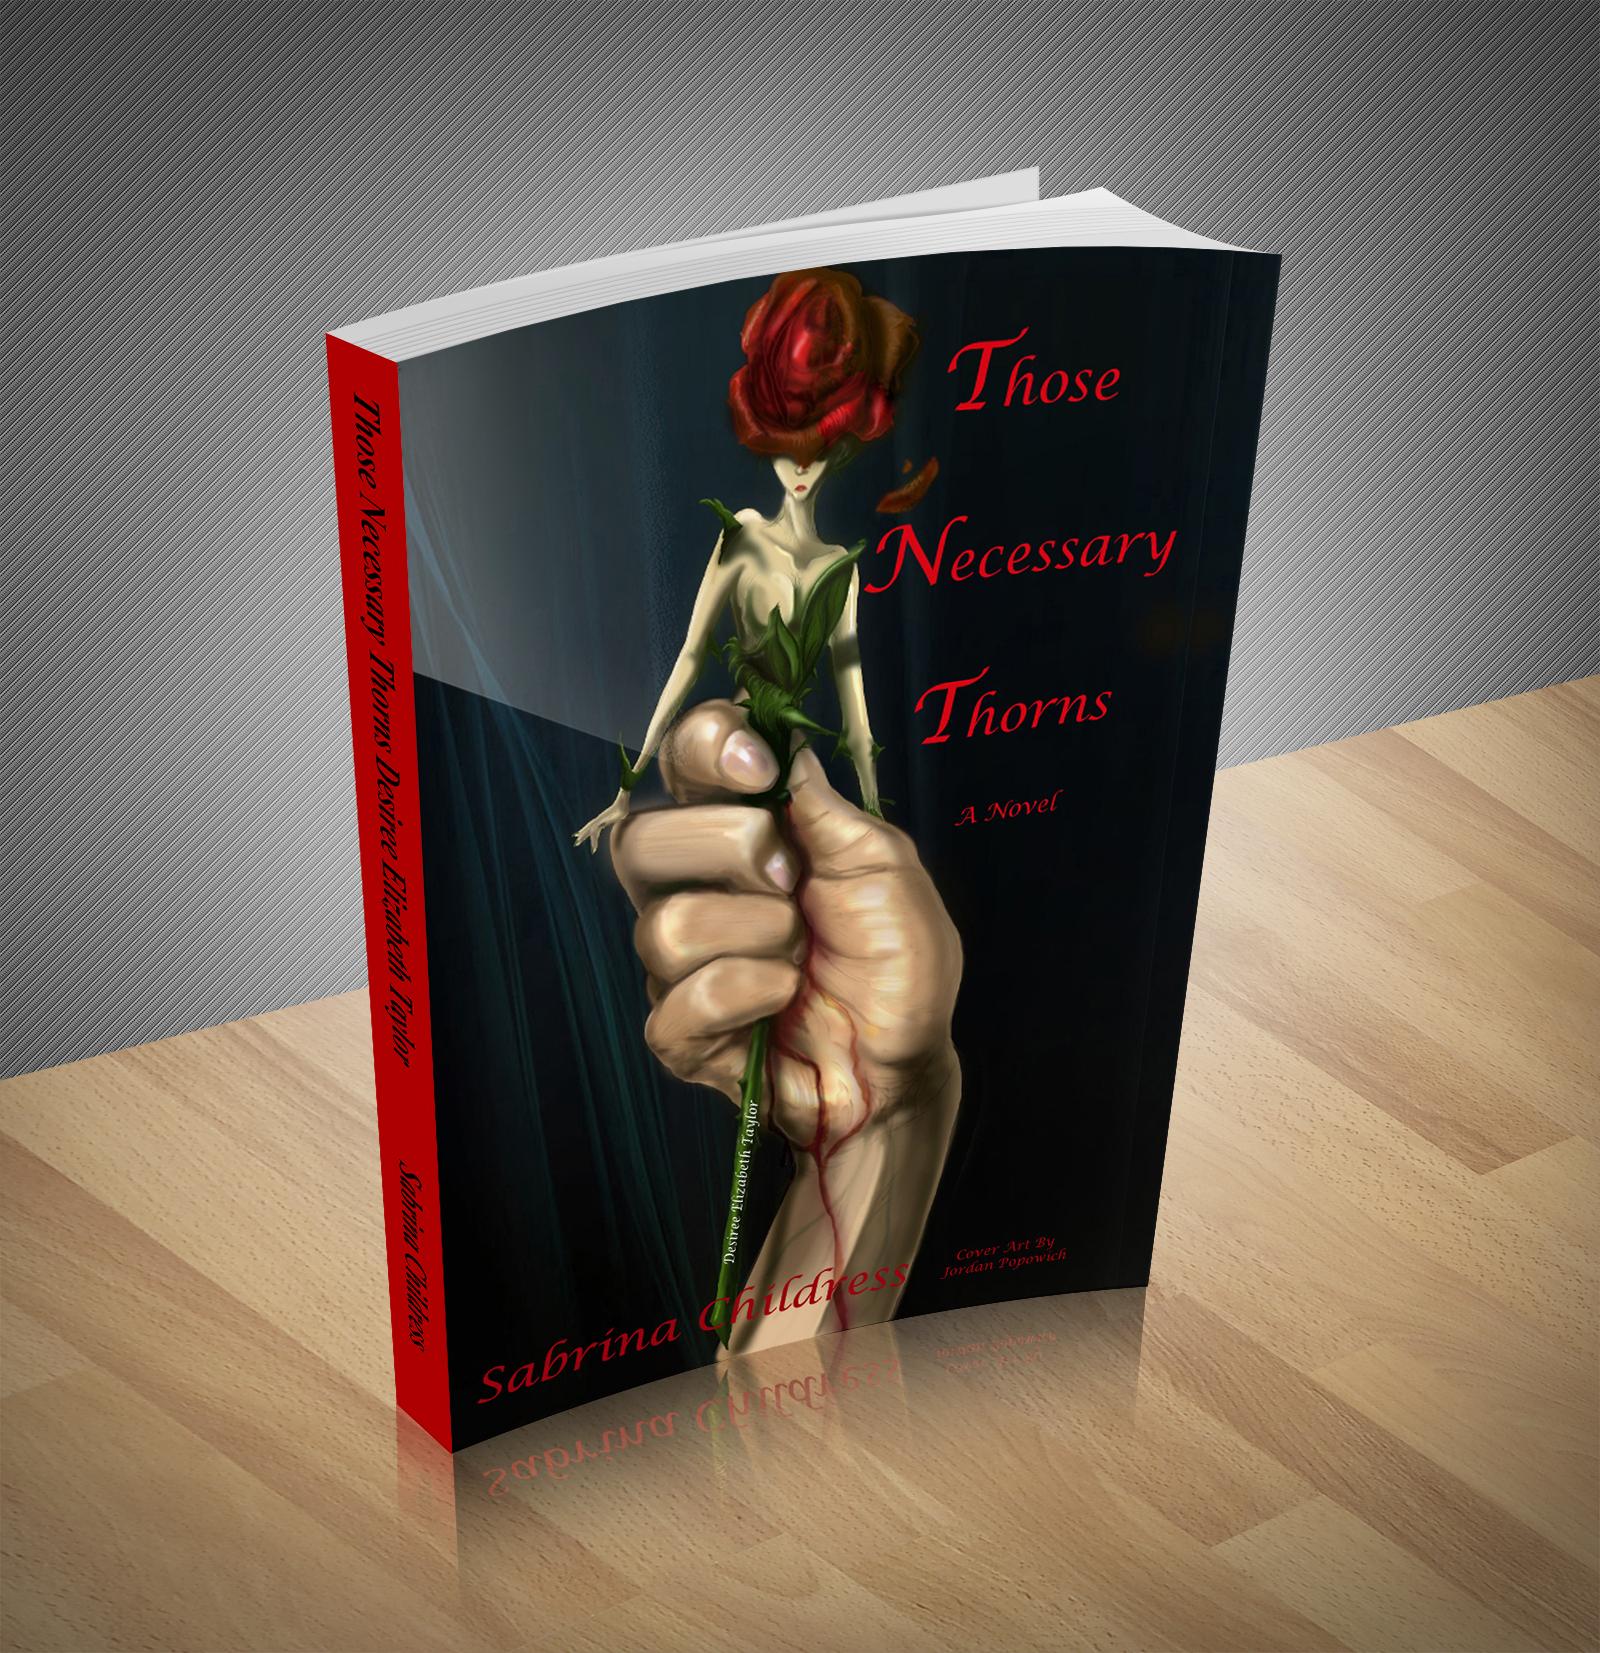 2-Those_Necessary_Thorns_Desire_Elizabeth_Taylor_Full_Jacket